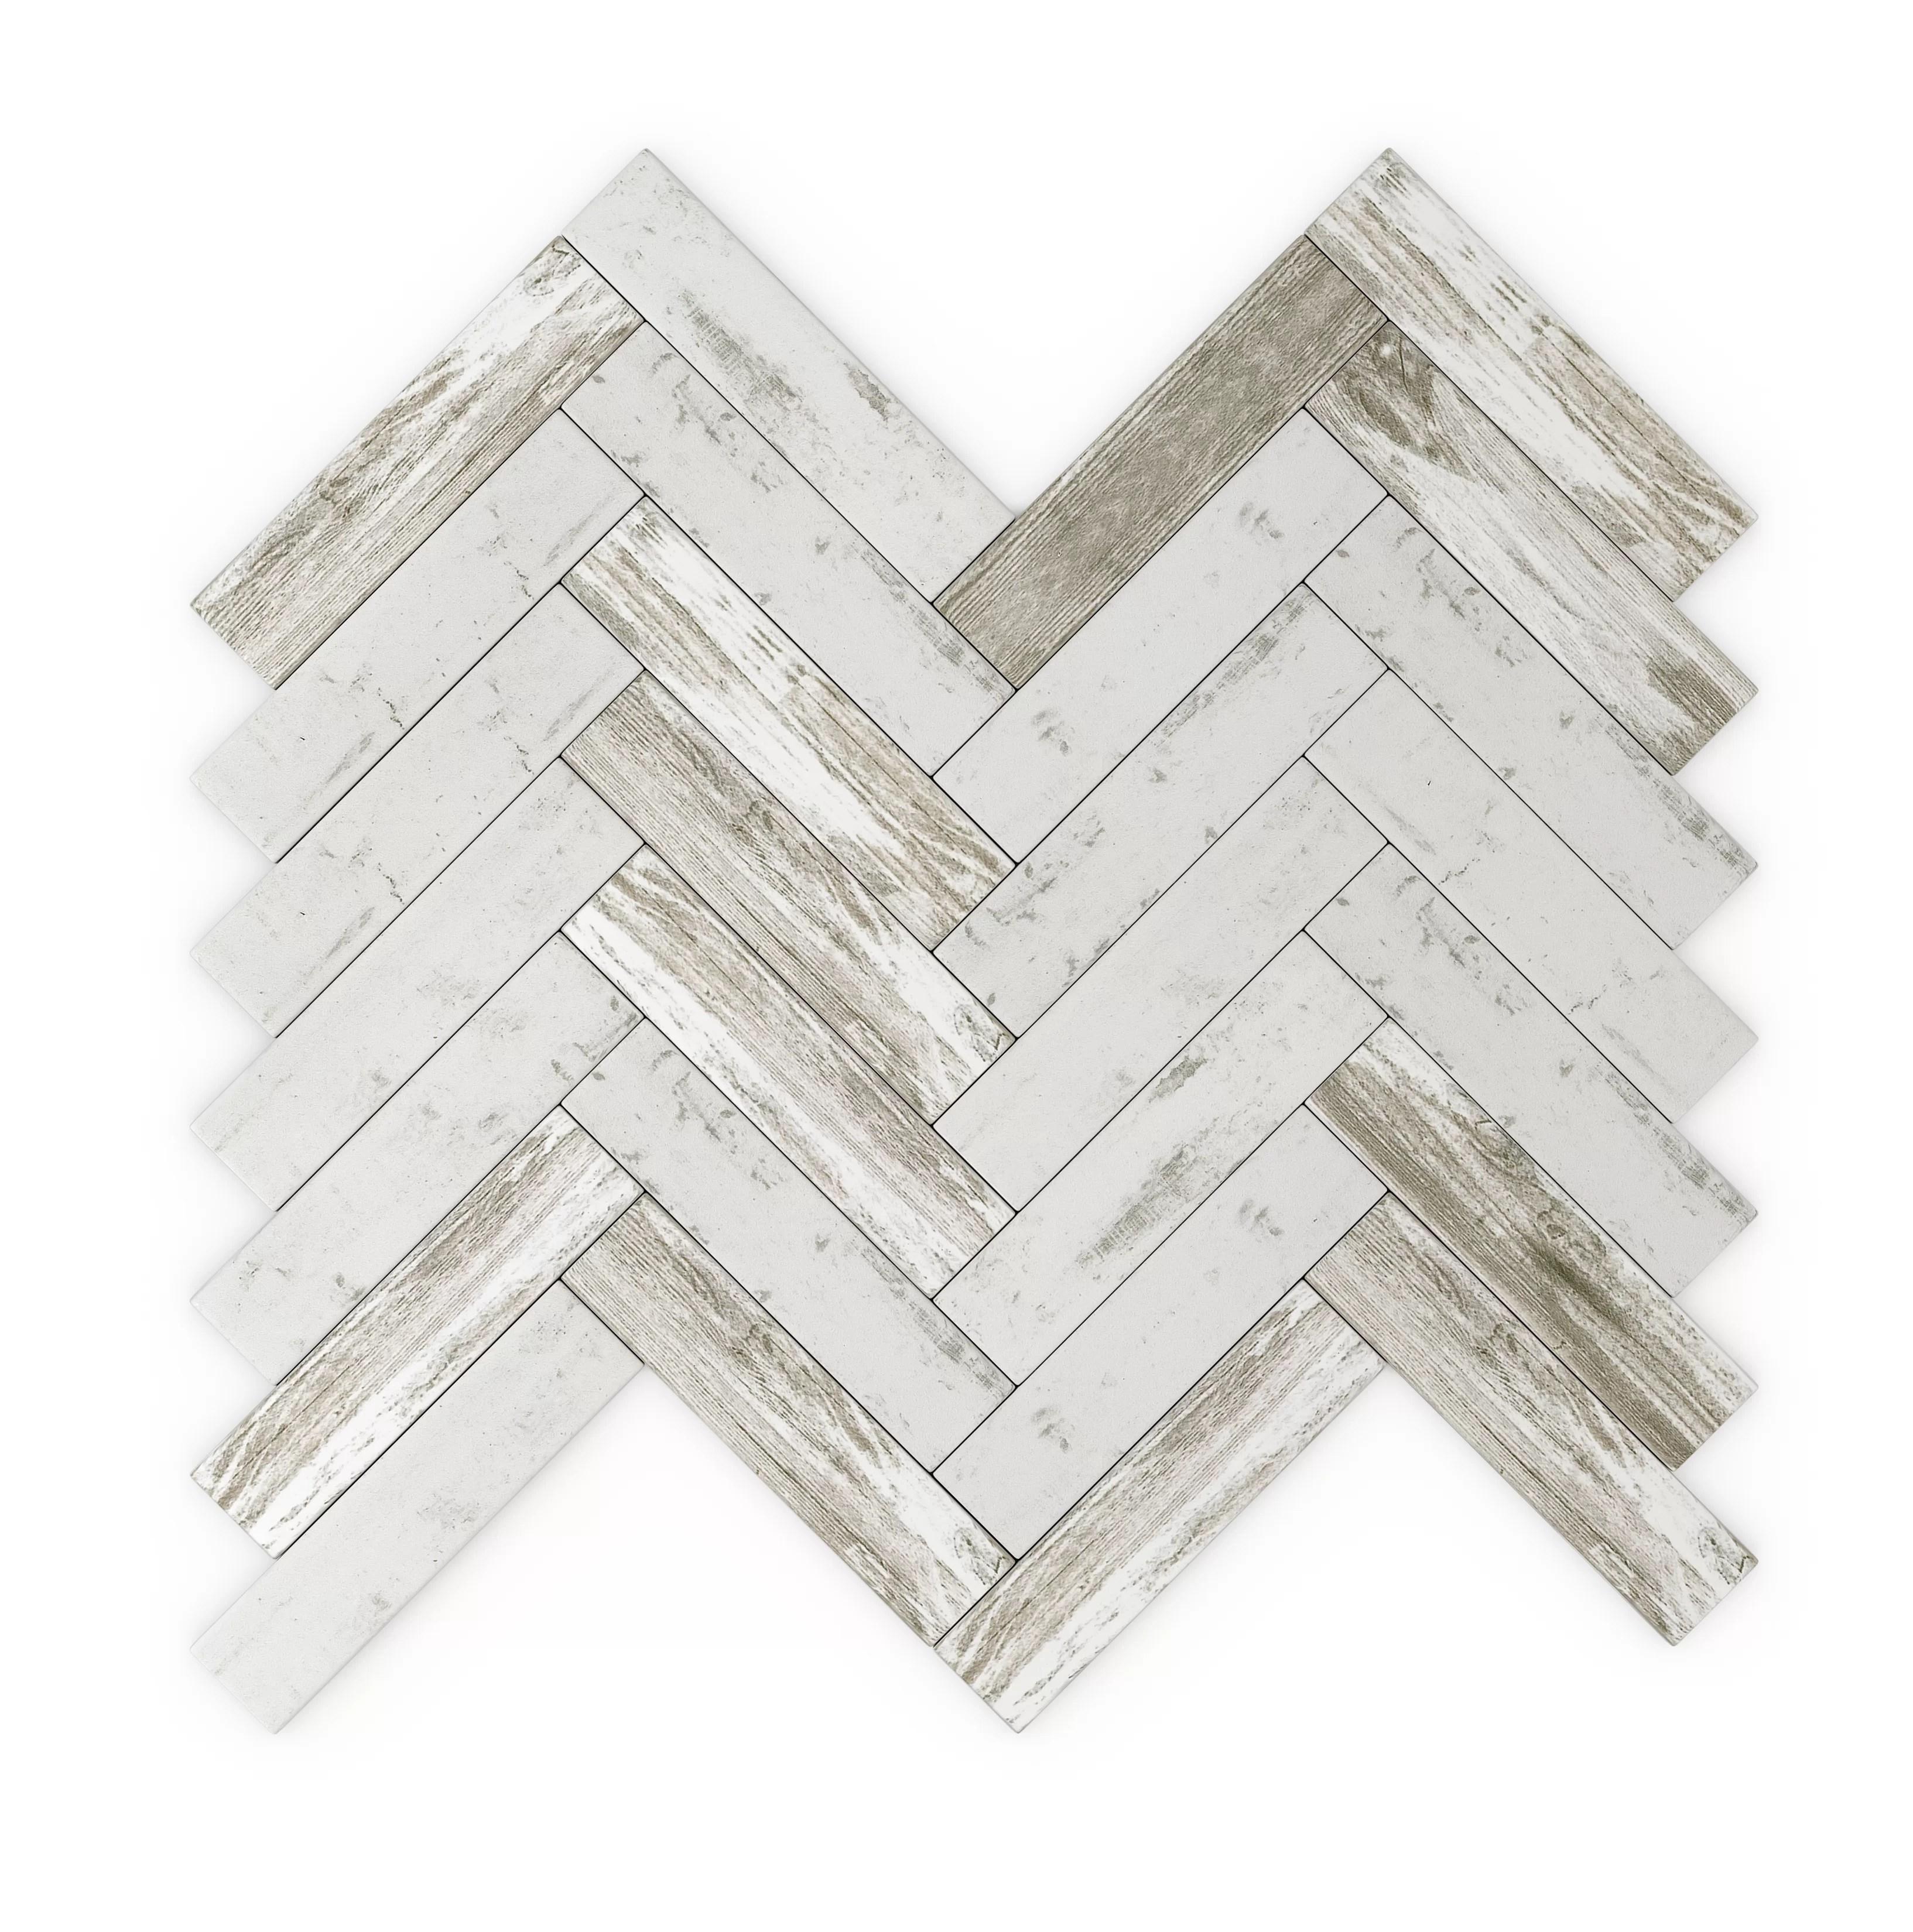 12 x 11 glass peel stick mosaic tile